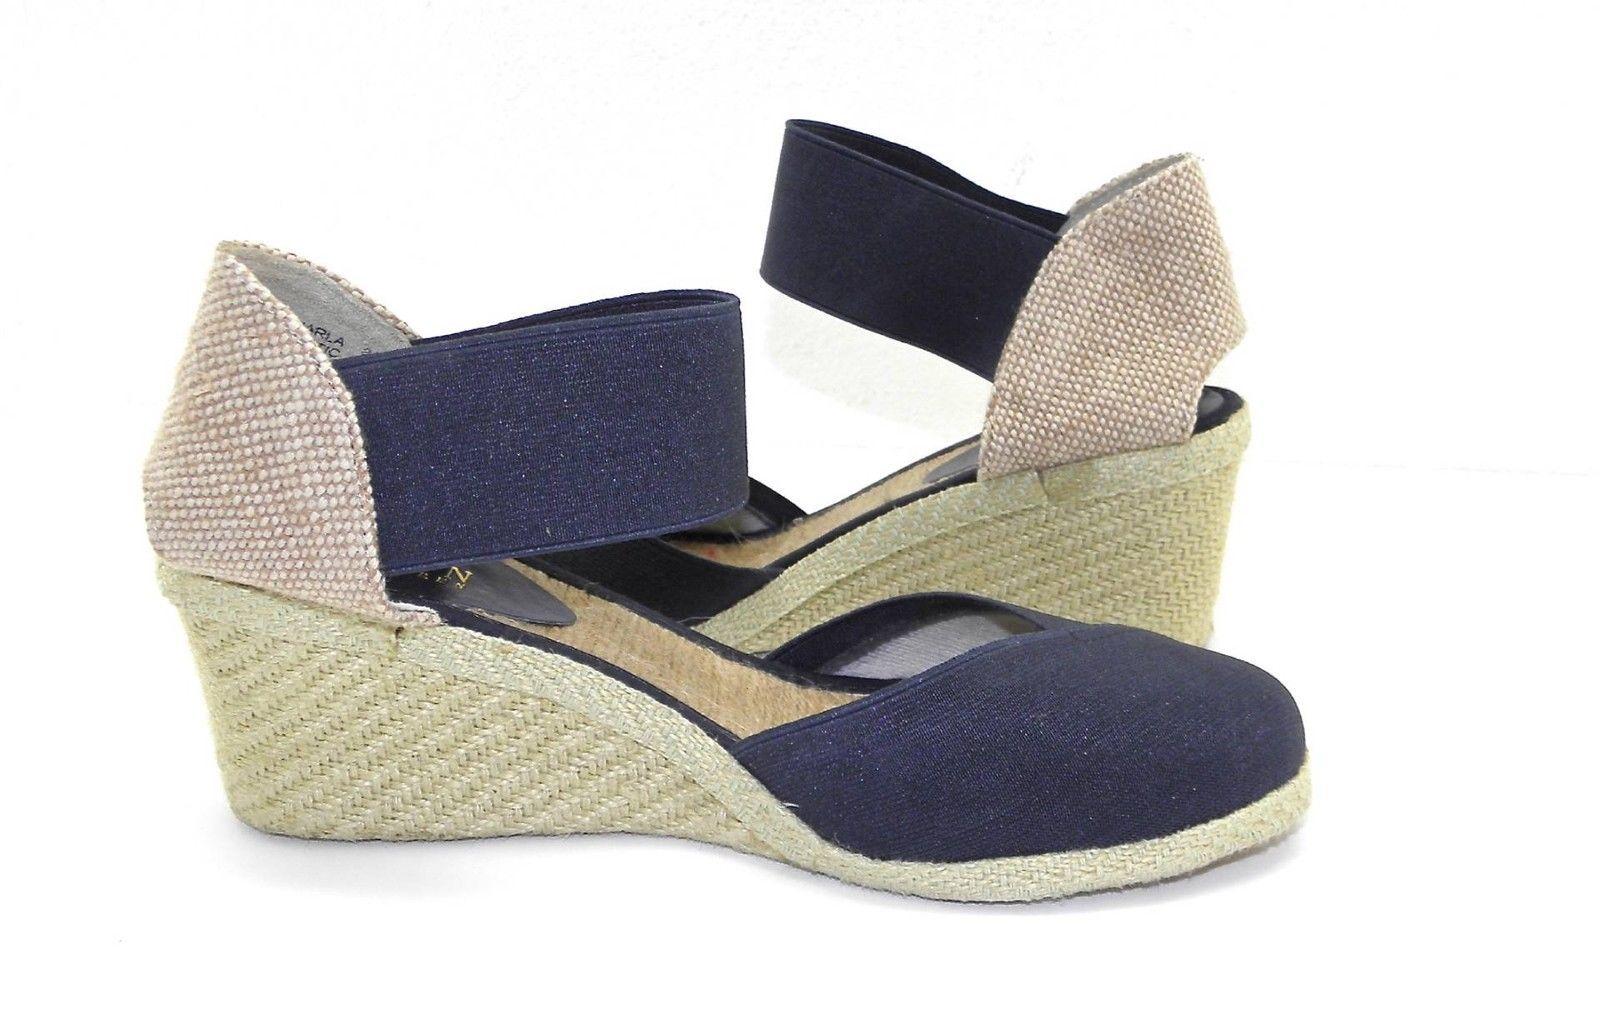 womens ralph lauren charla navy elastic wedges sandals espadrille shoes 8 5 b mixed items lots. Black Bedroom Furniture Sets. Home Design Ideas